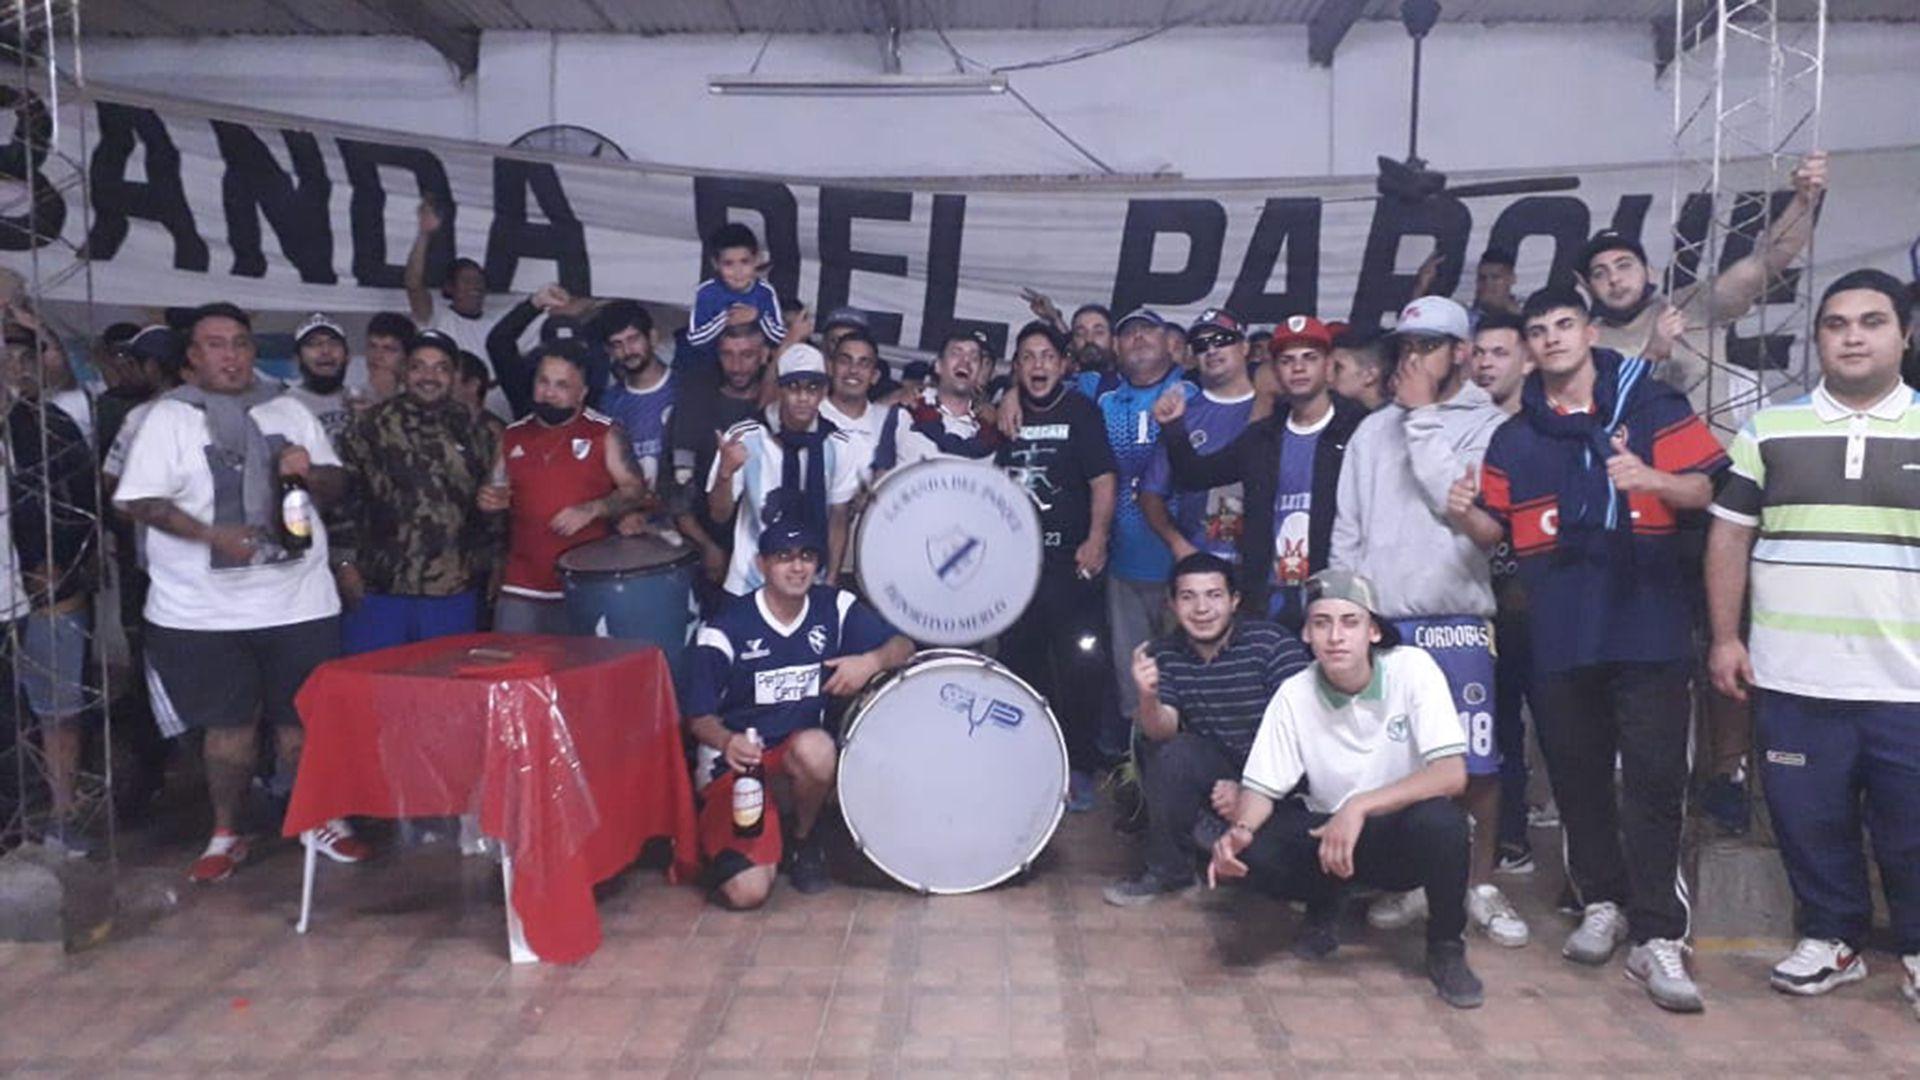 Barra Deportivo Merlo